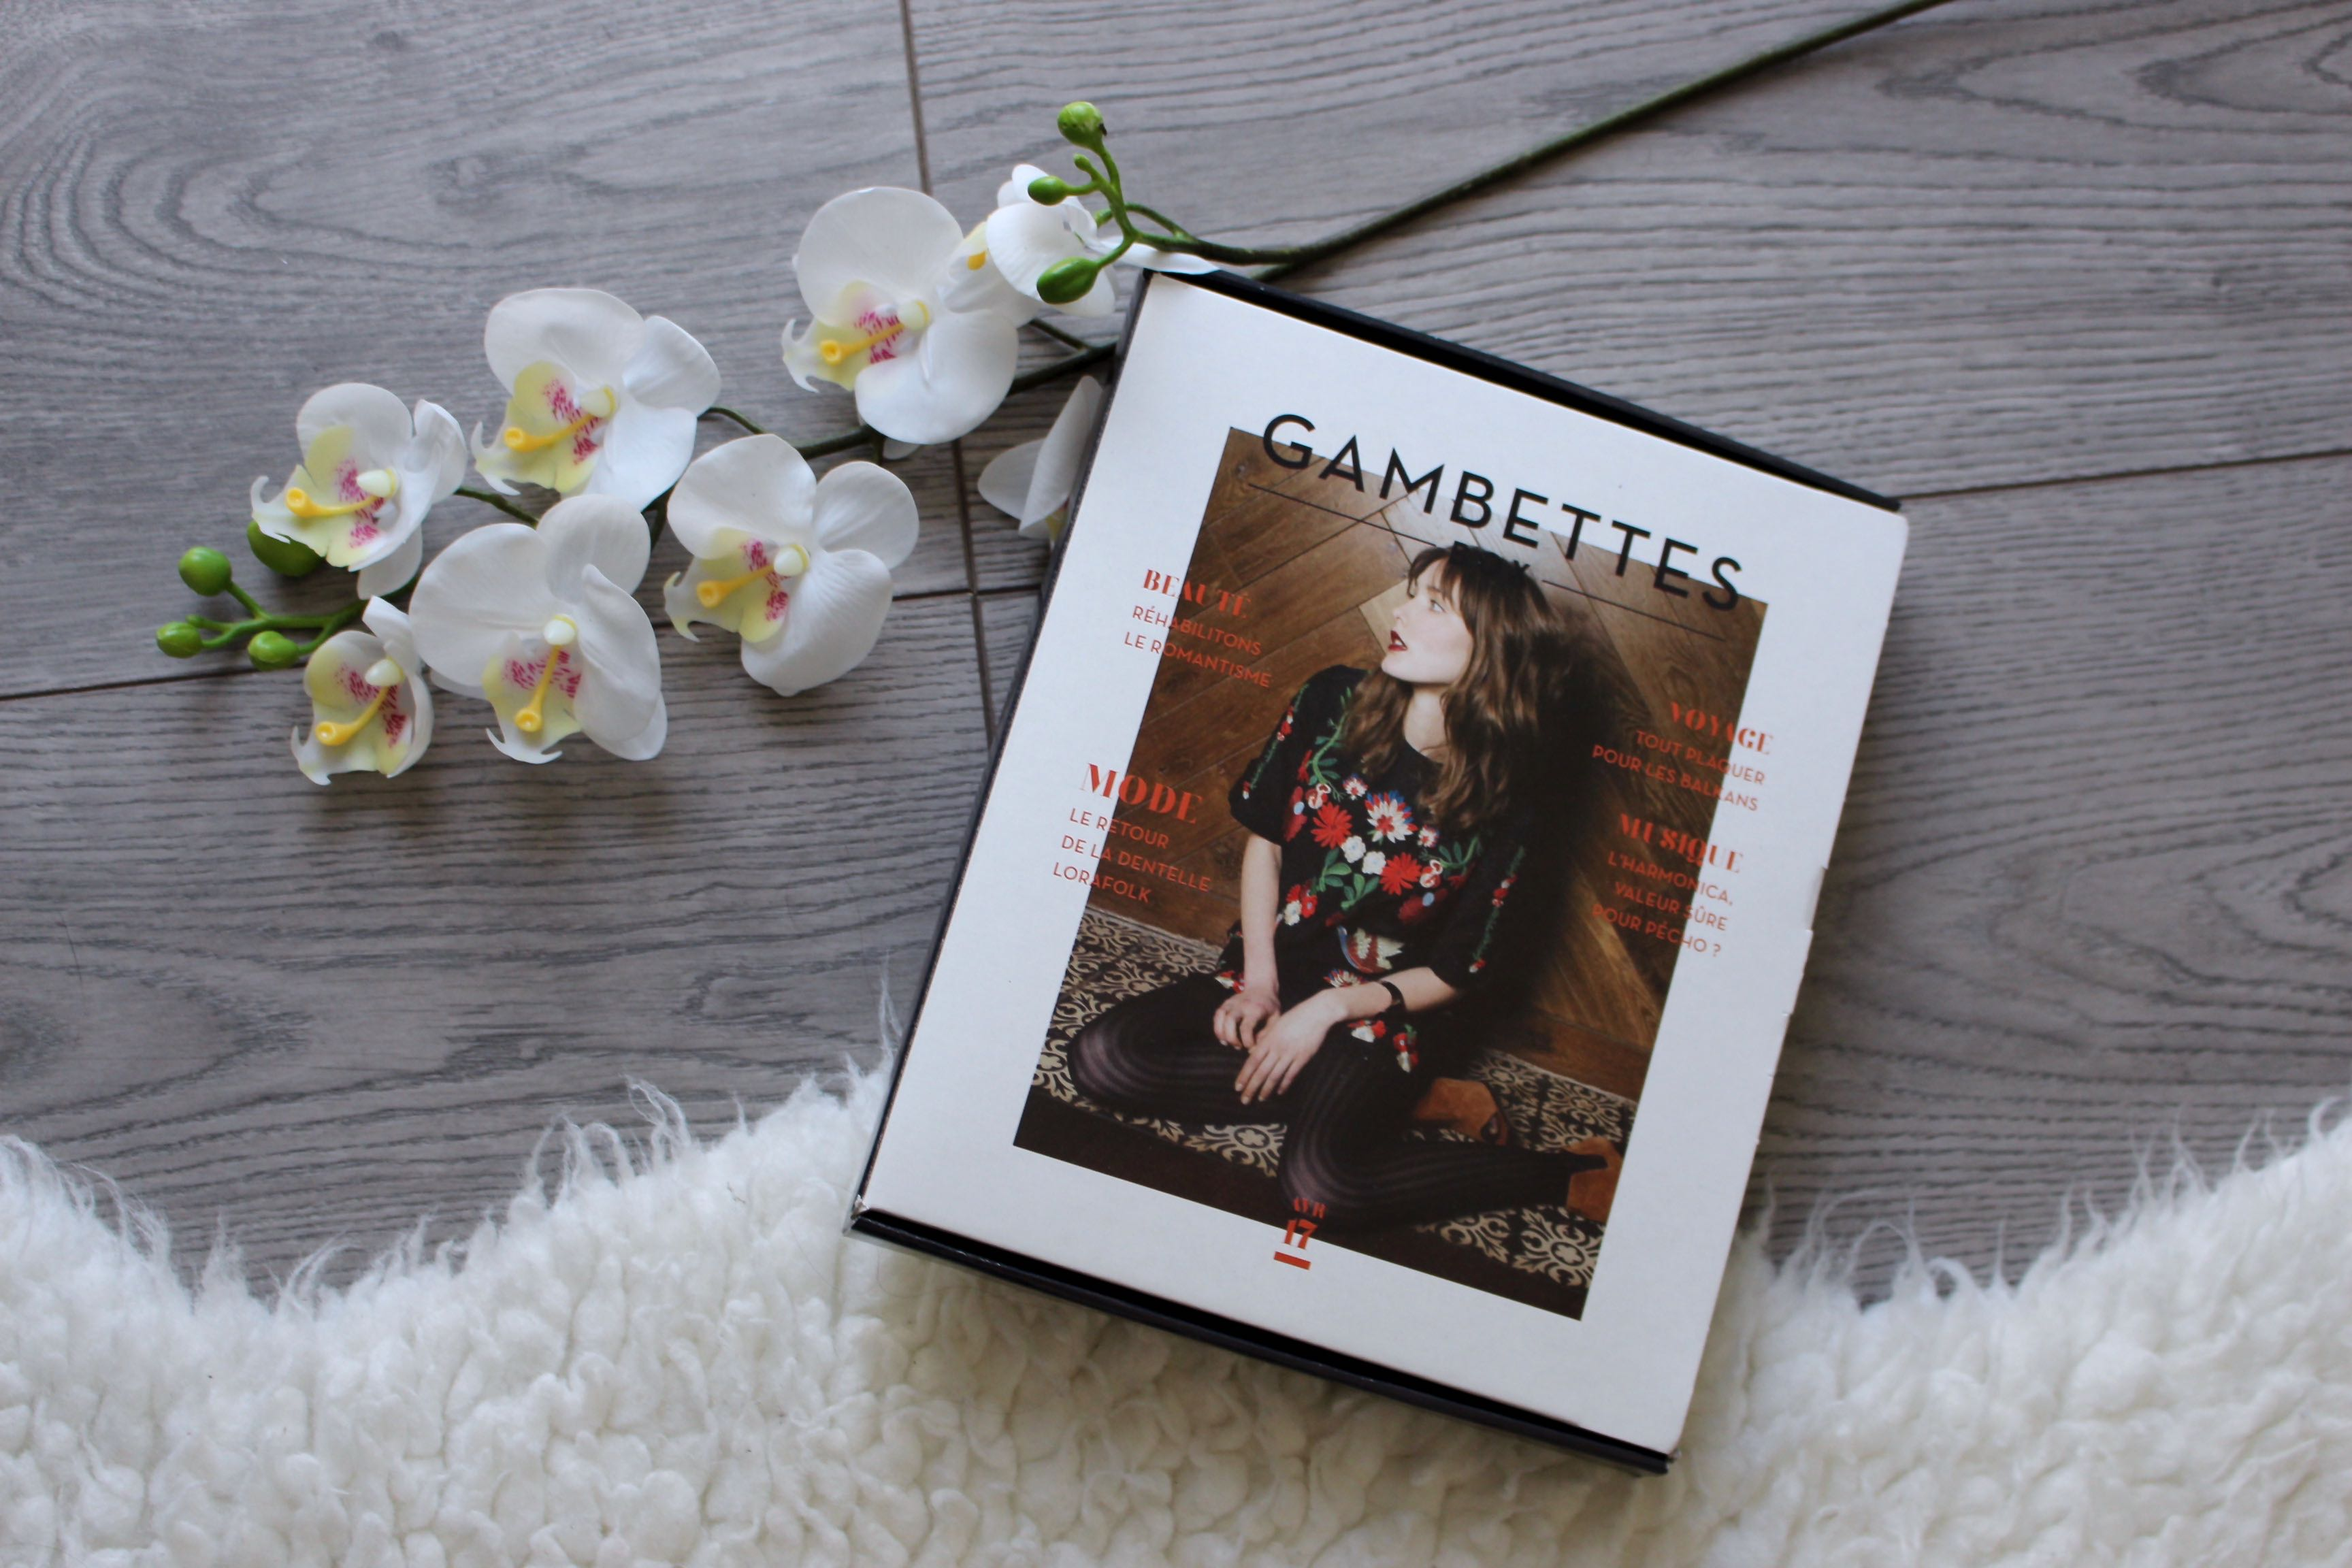 gambettes box avril presentation mademoiselle-e